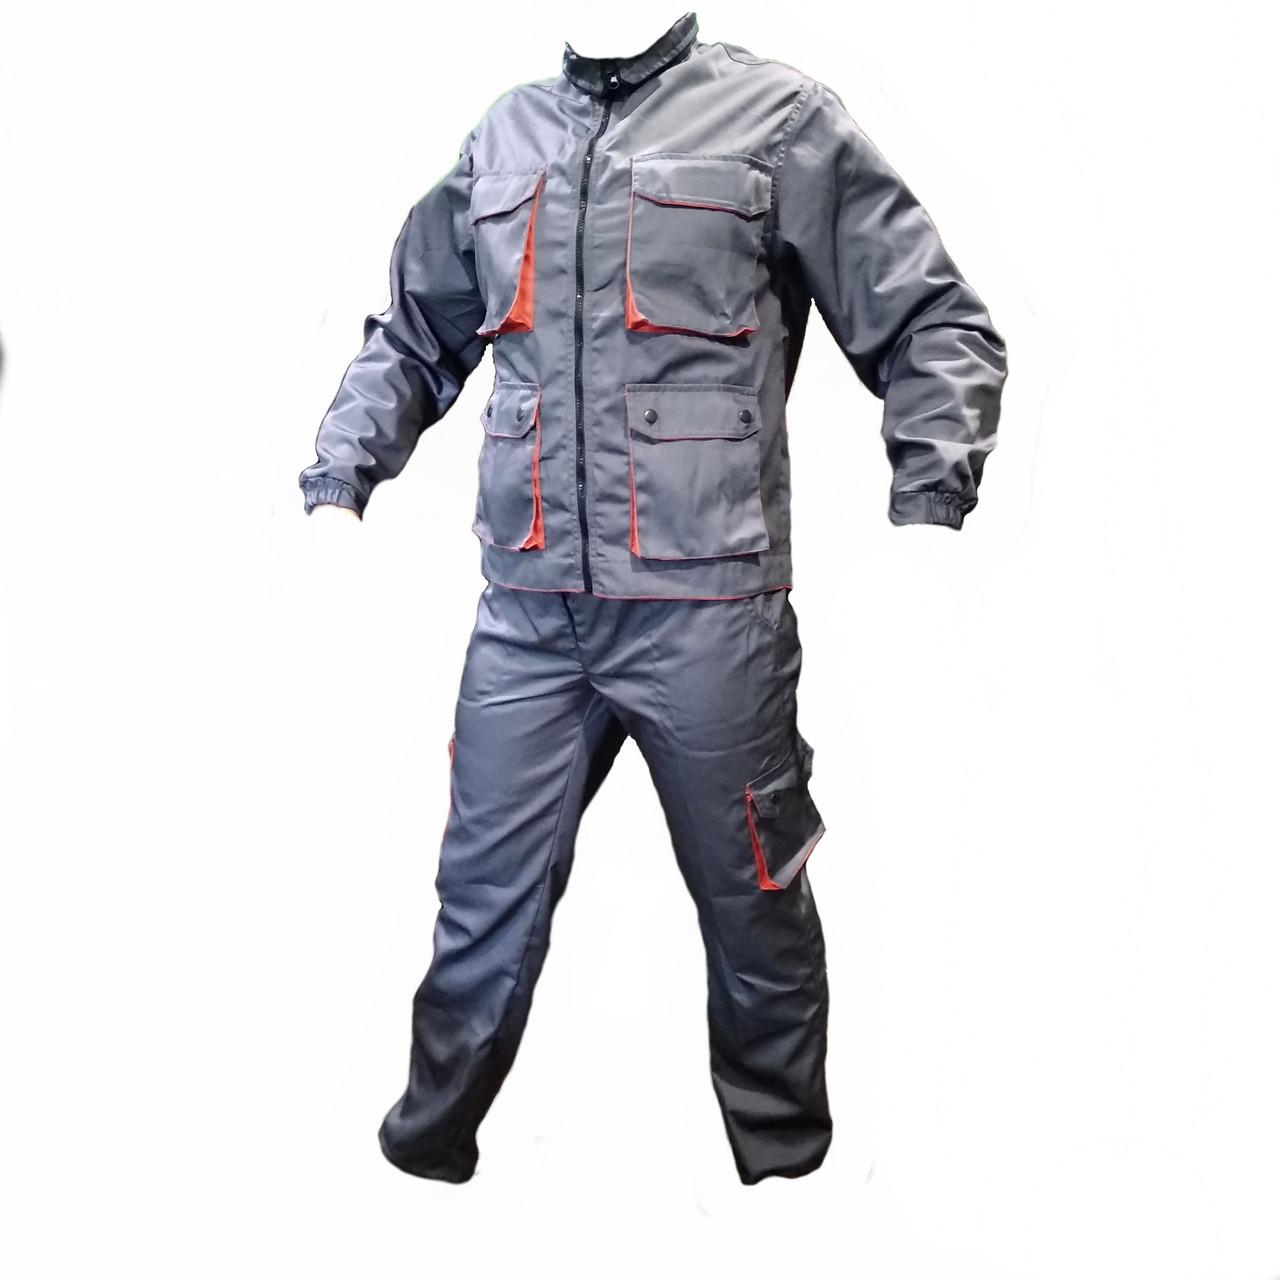 Костюм Рабочий (worker) куртка + полукомбинезон